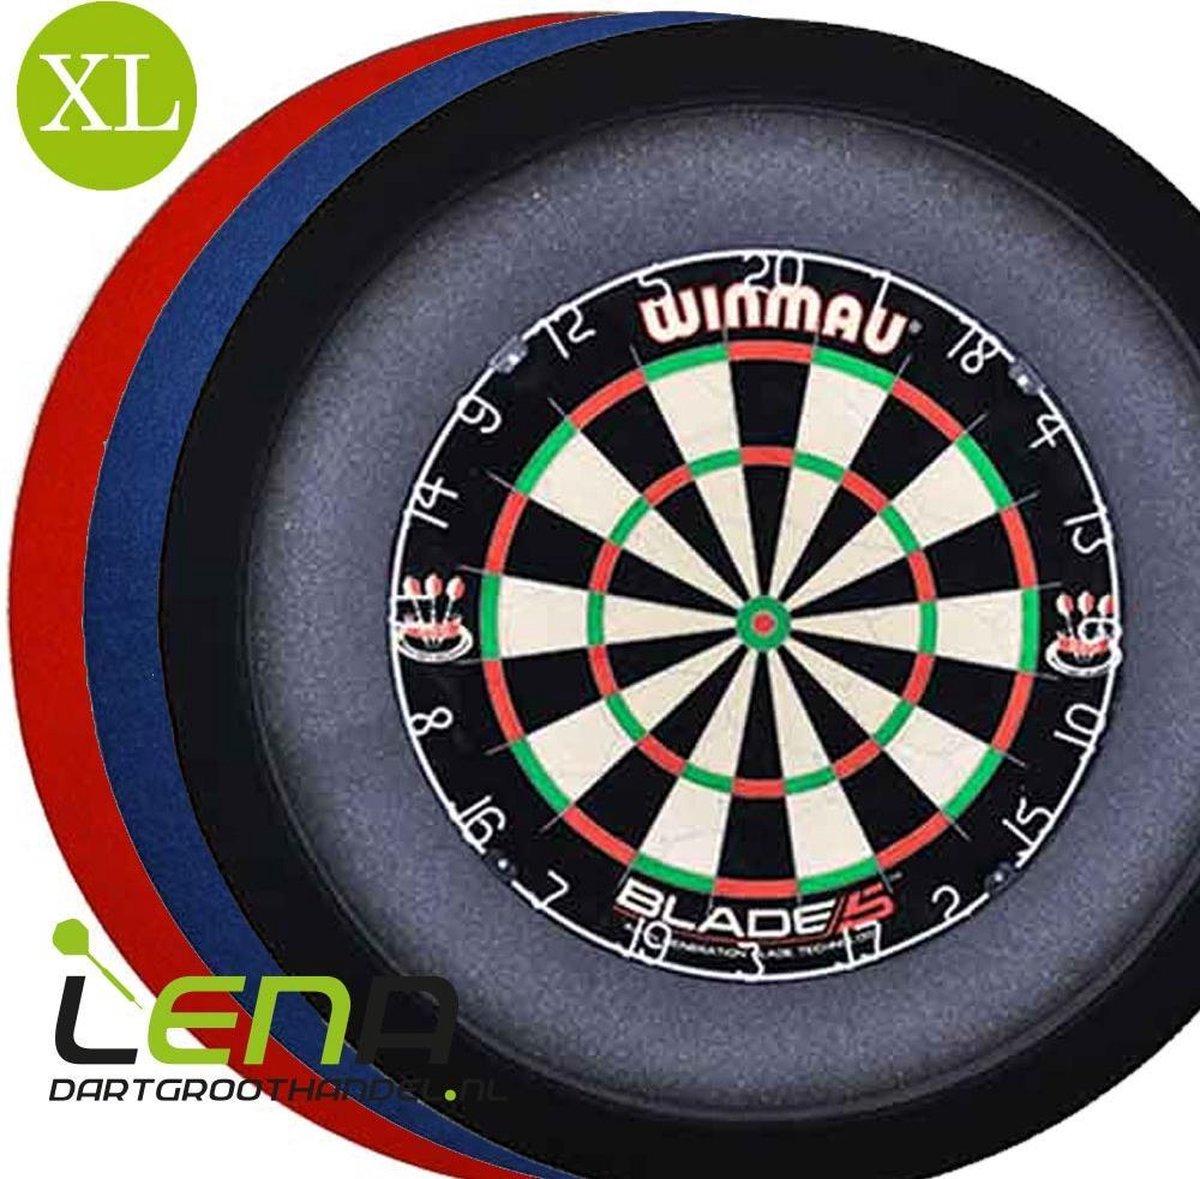 LENA Dartbord Verlichting BASIC XL (Grijs)